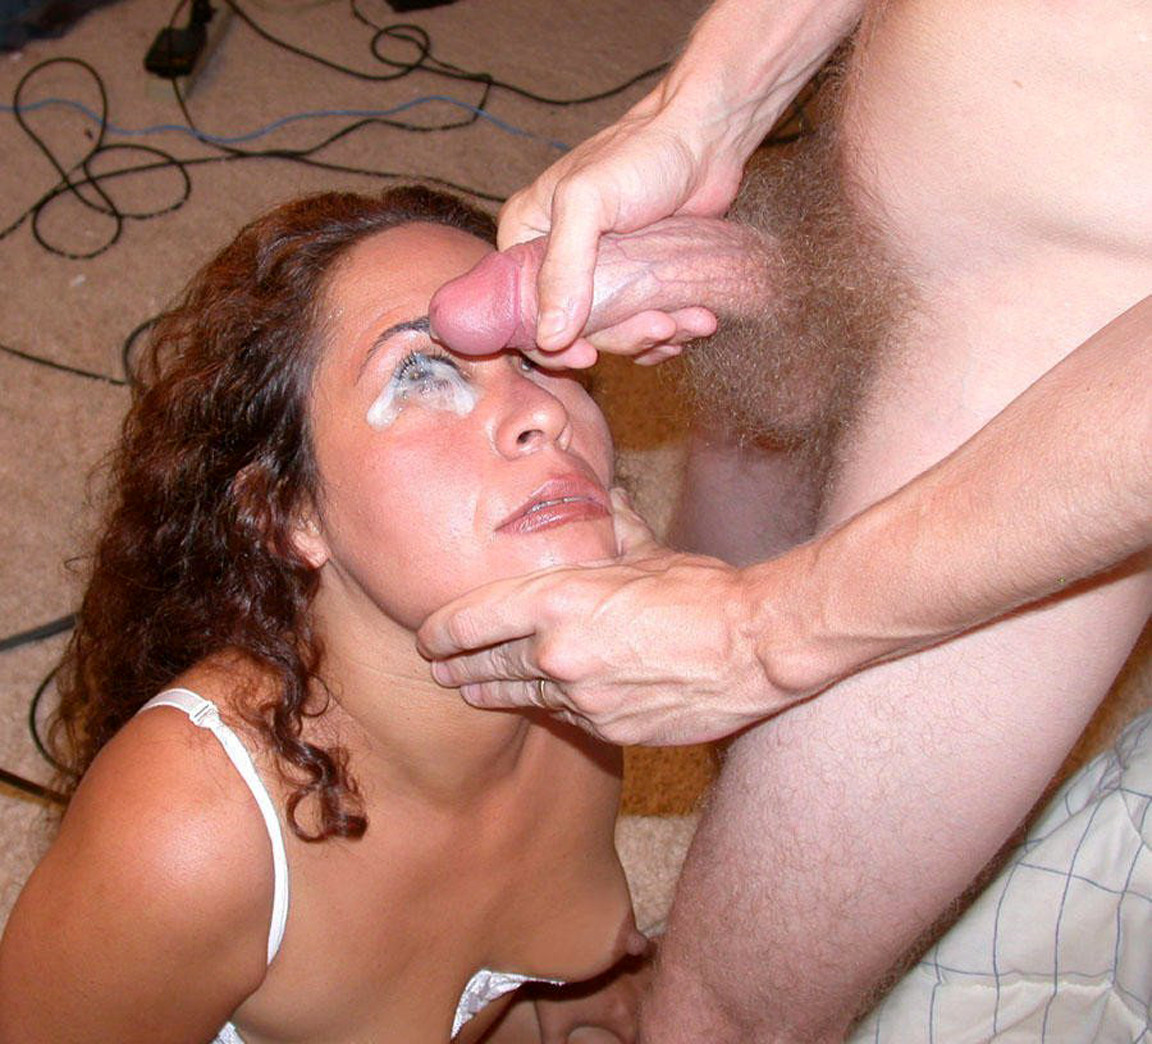 Онлайн кончил в глаз жене женщина большим